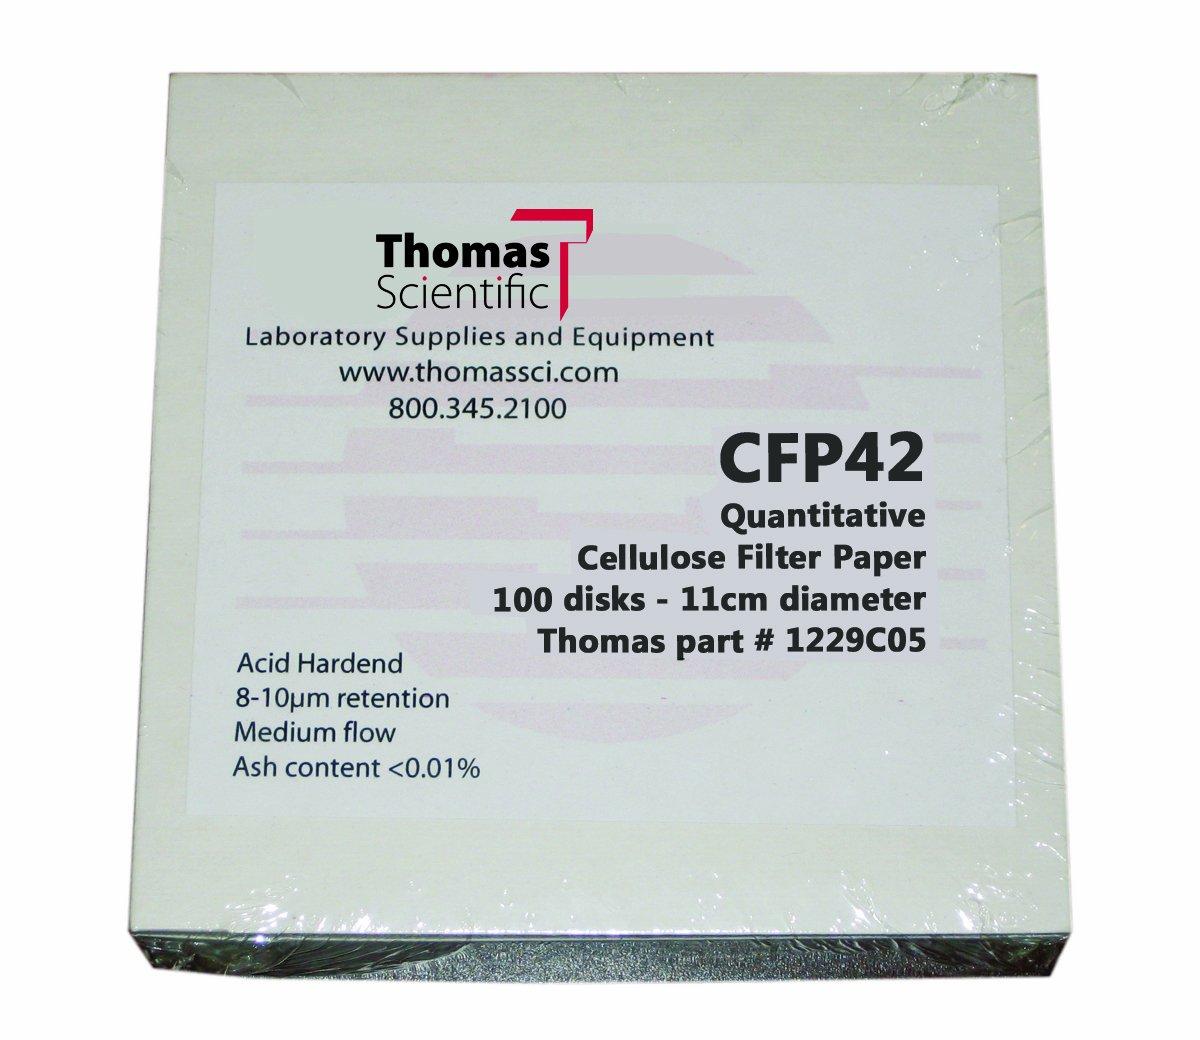 Thomas CFP42-150 Cellulose Quantitative Filter Paper 2-3 Micron Pack of 100 Slow Flow 15cm Diameter Grade CFP42